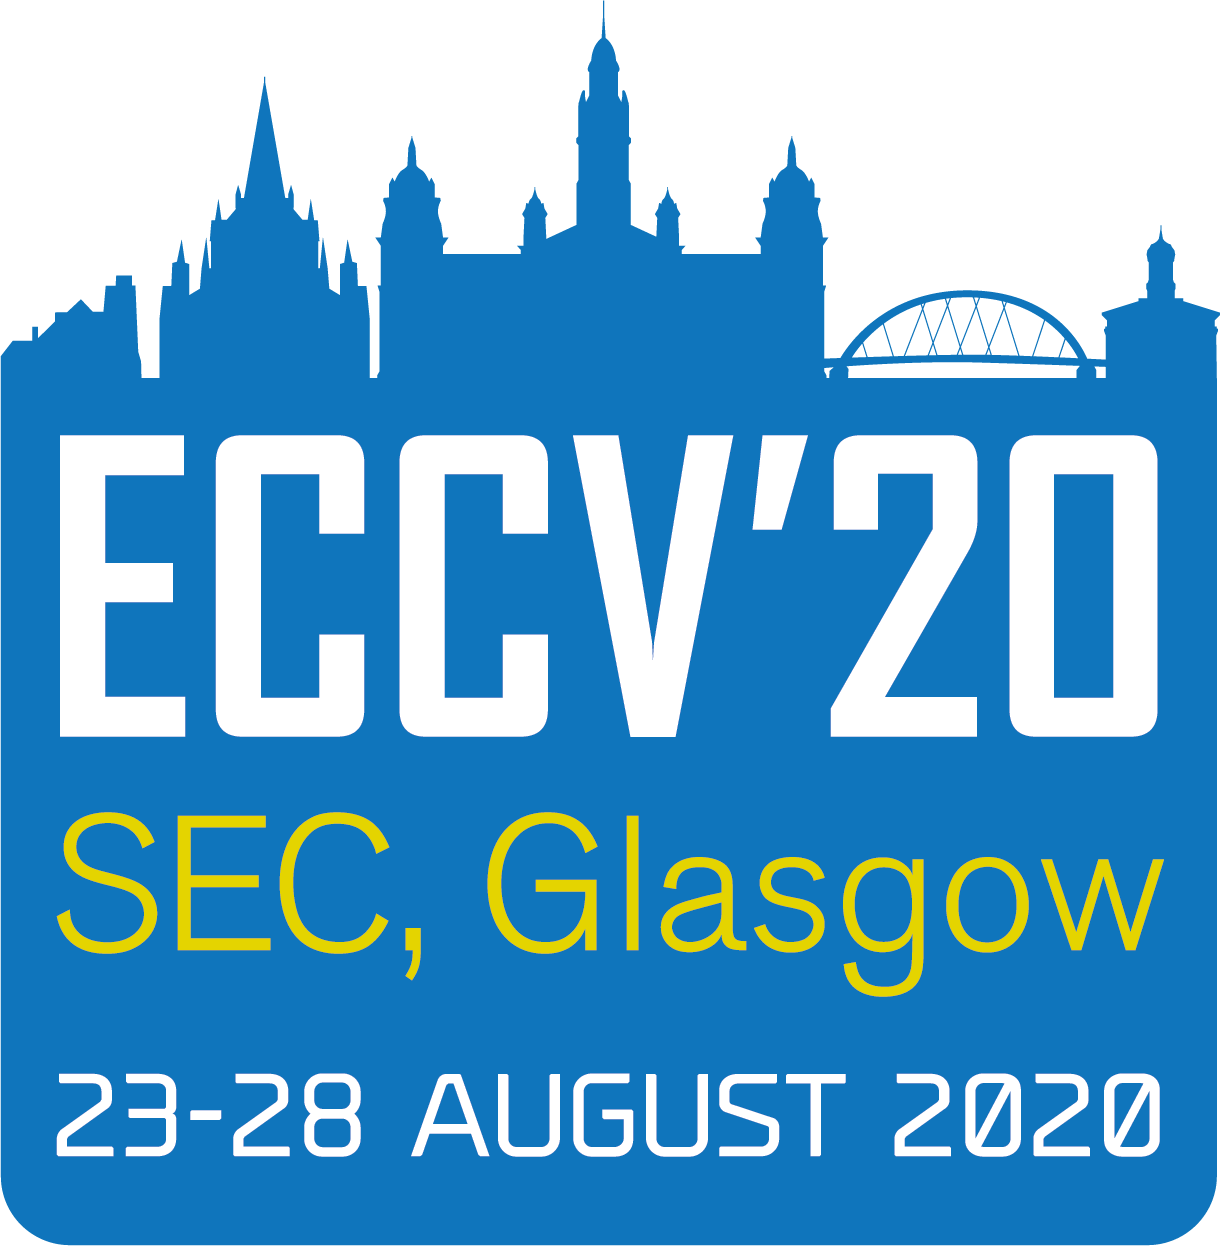 ECCV 2020 Glasgow